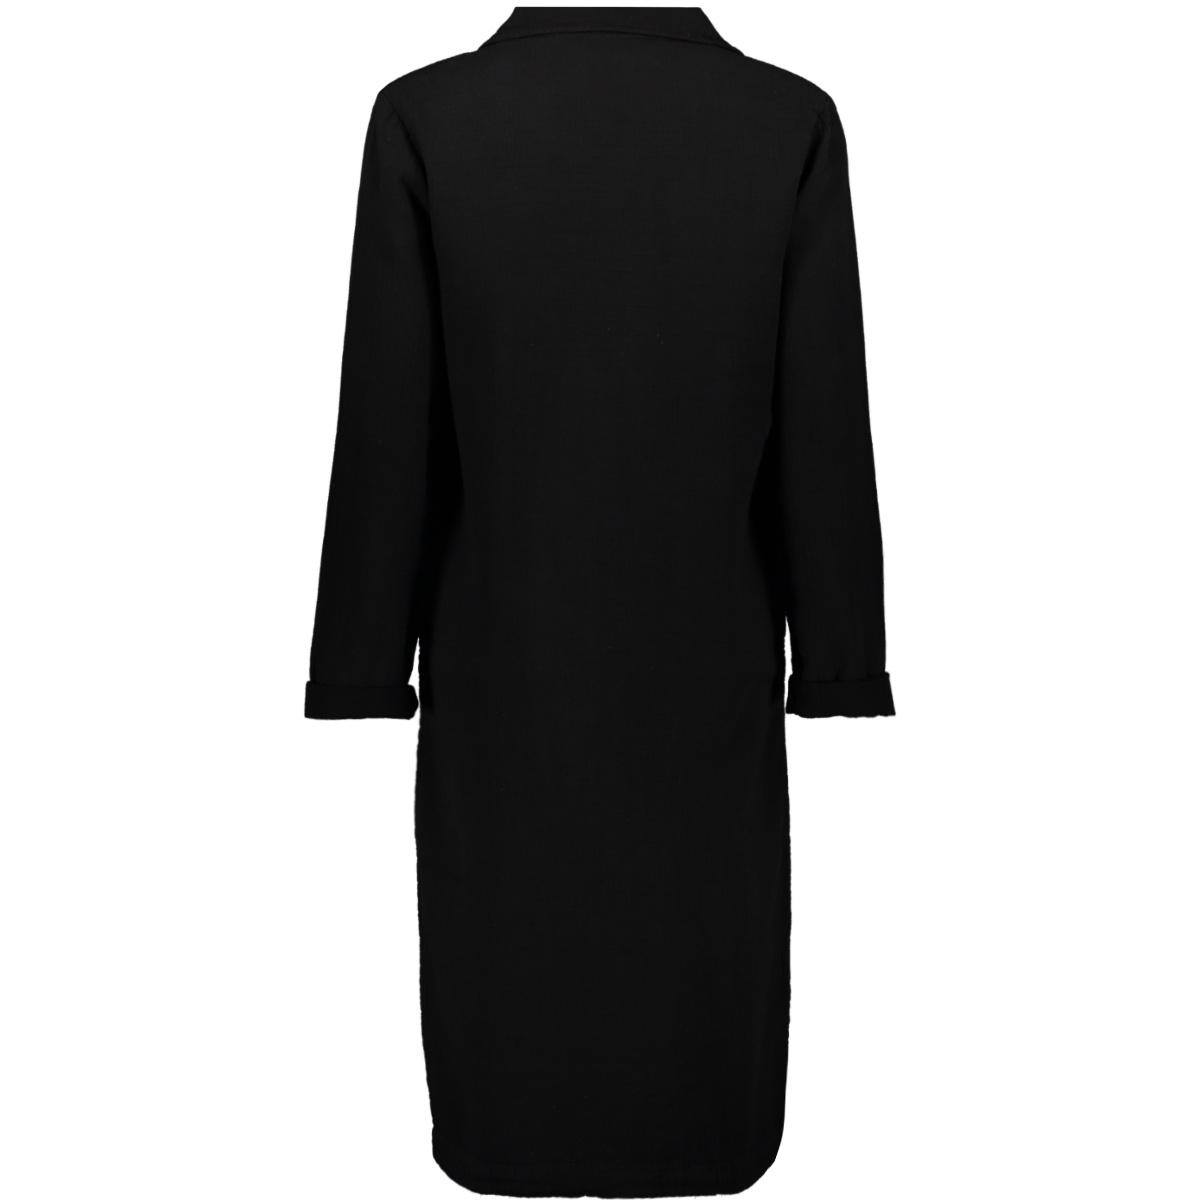 20 508 9101 10 days blazer black